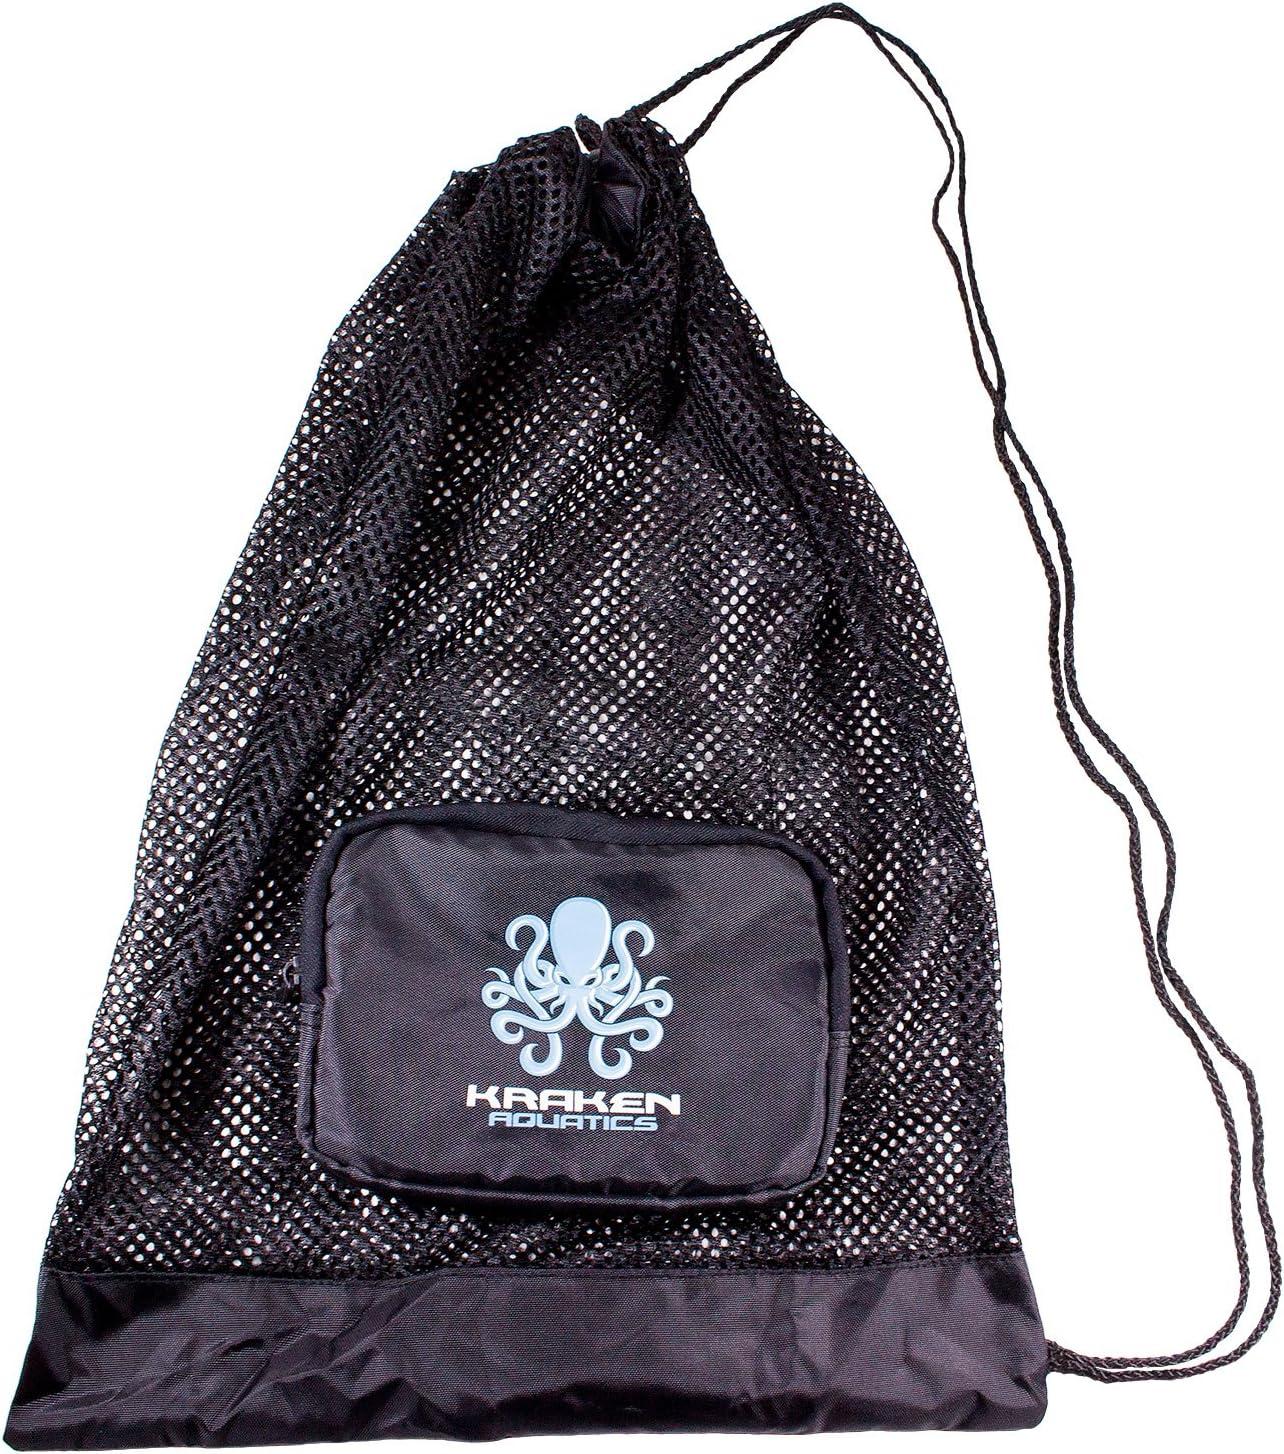 Kraken Aquatics Compact Mesh Gear Bag | for Scuba Diving, Snorkeling, Swimming, Beach and Sports Equipment : Sports & Outdoors